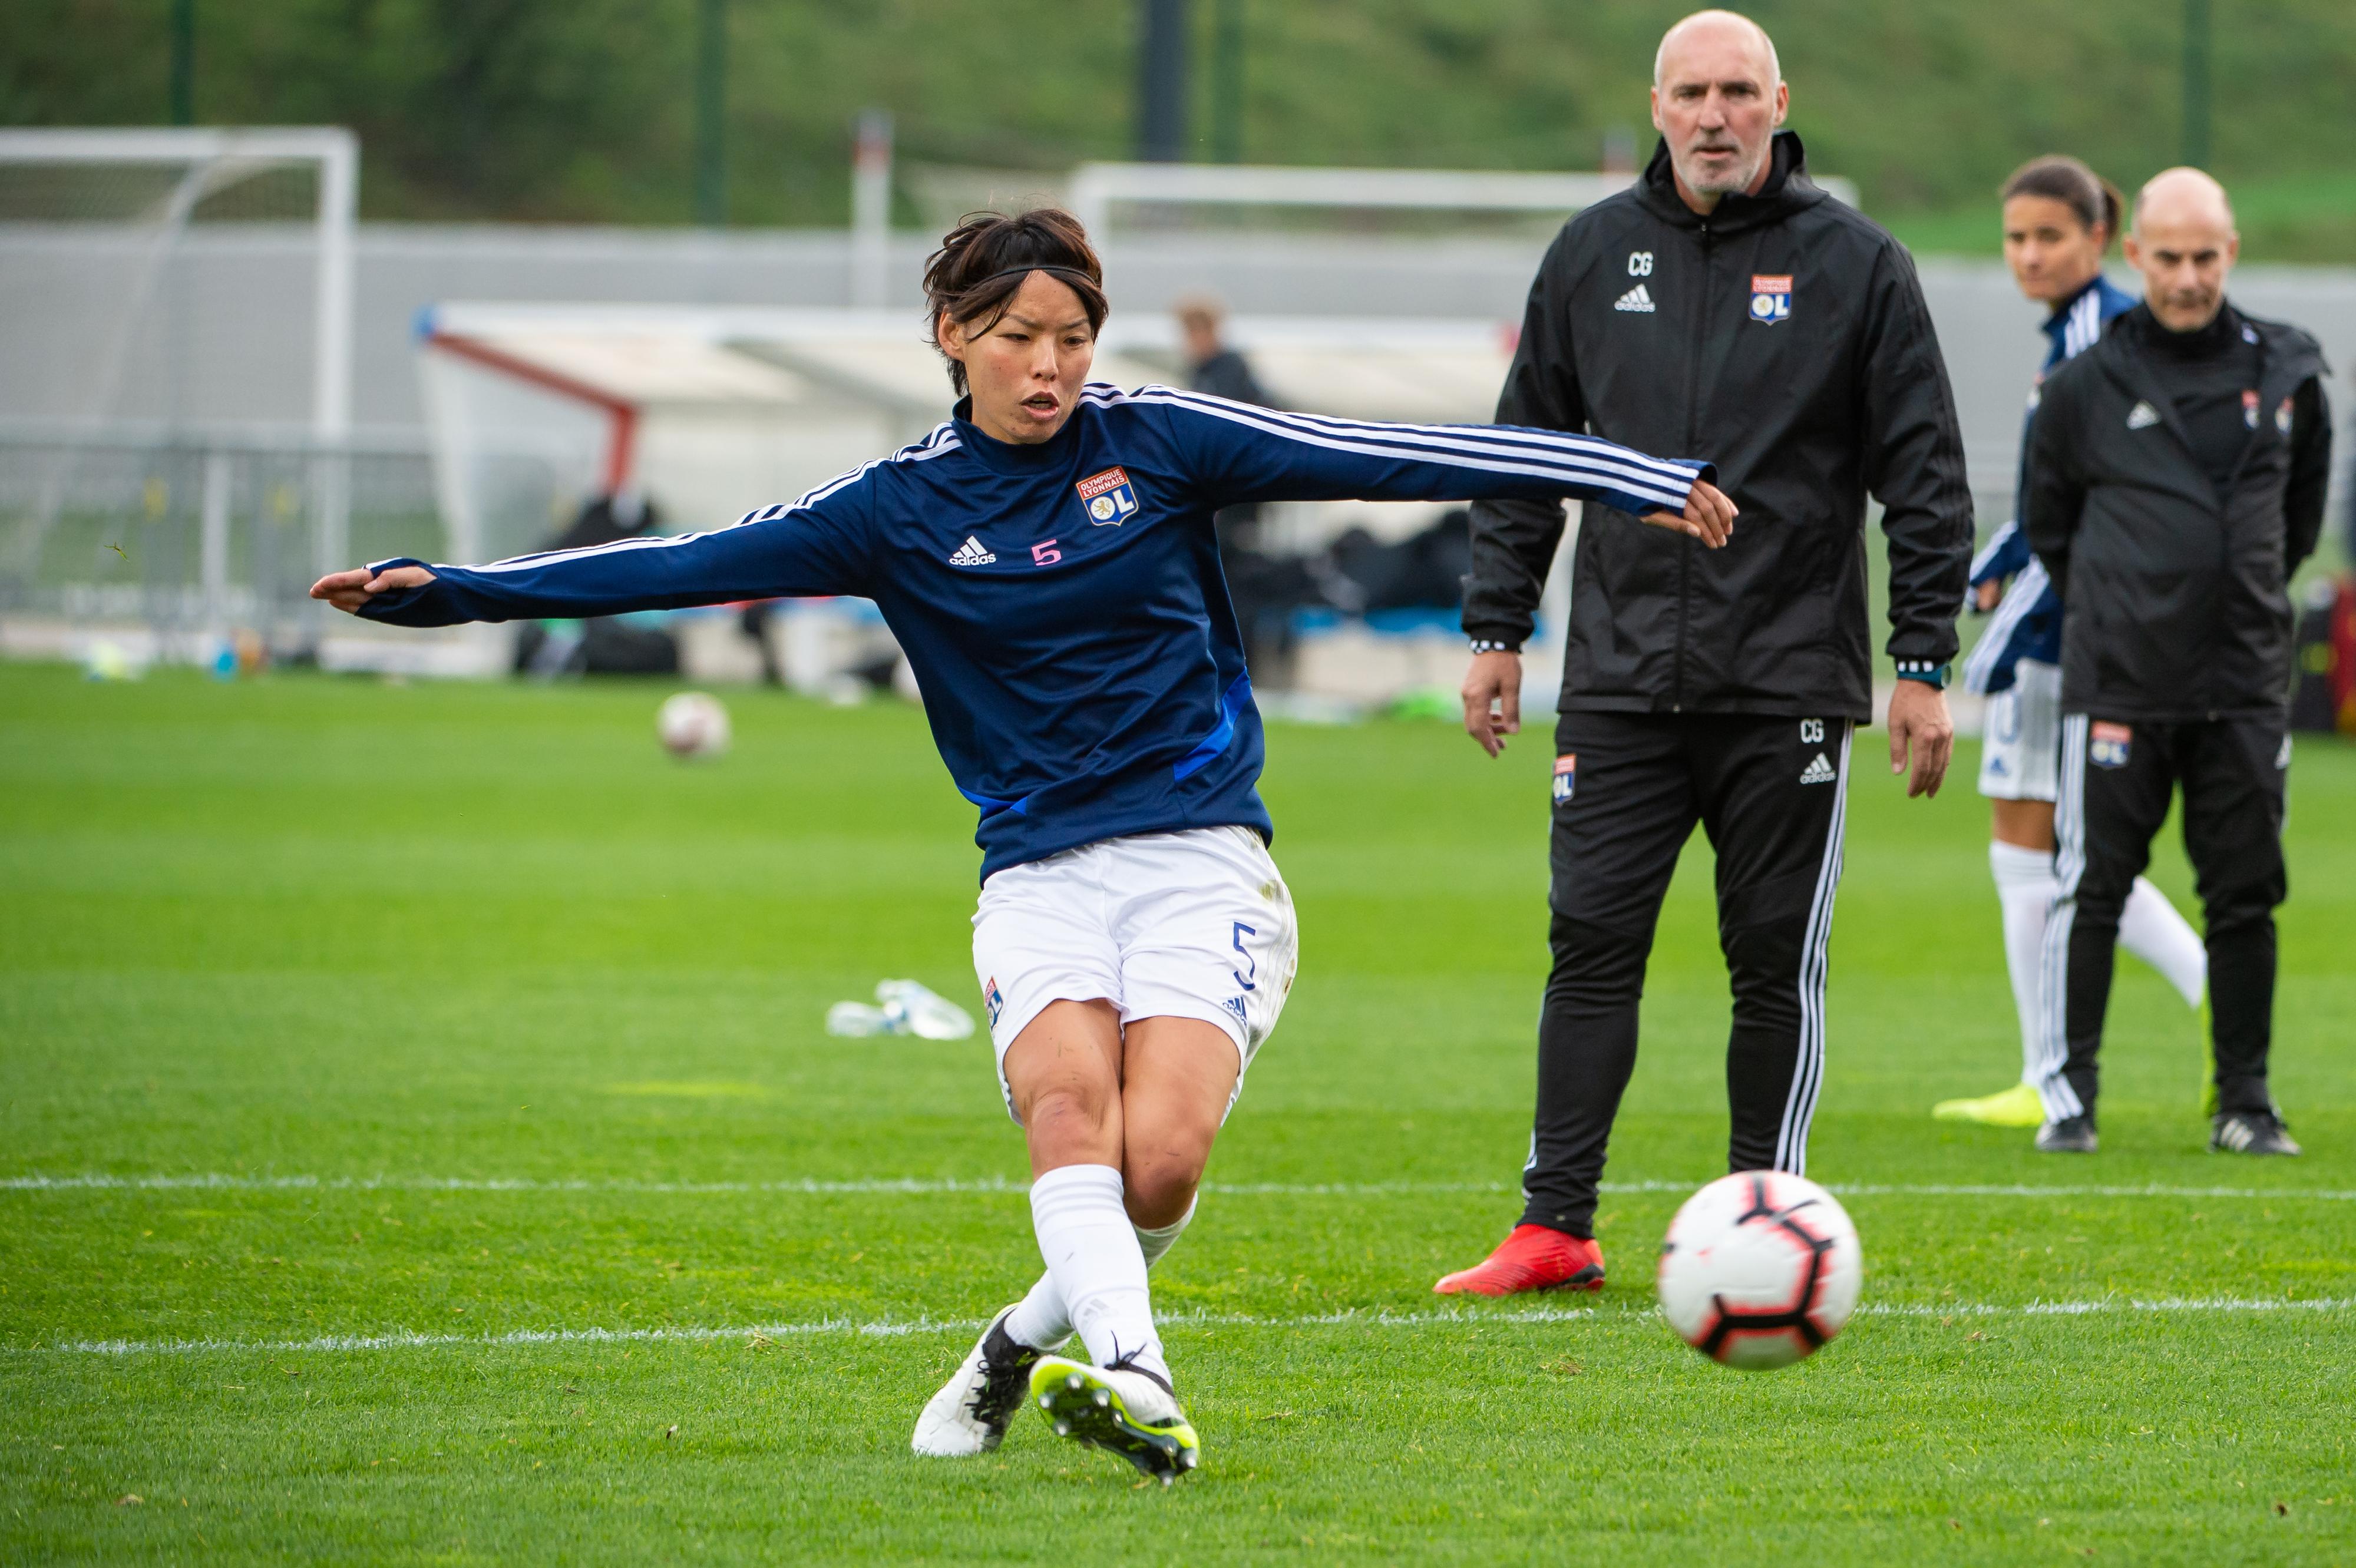 Olympique Lyon Women's v Fortuna Hjorring - UEFA Women's Champions League